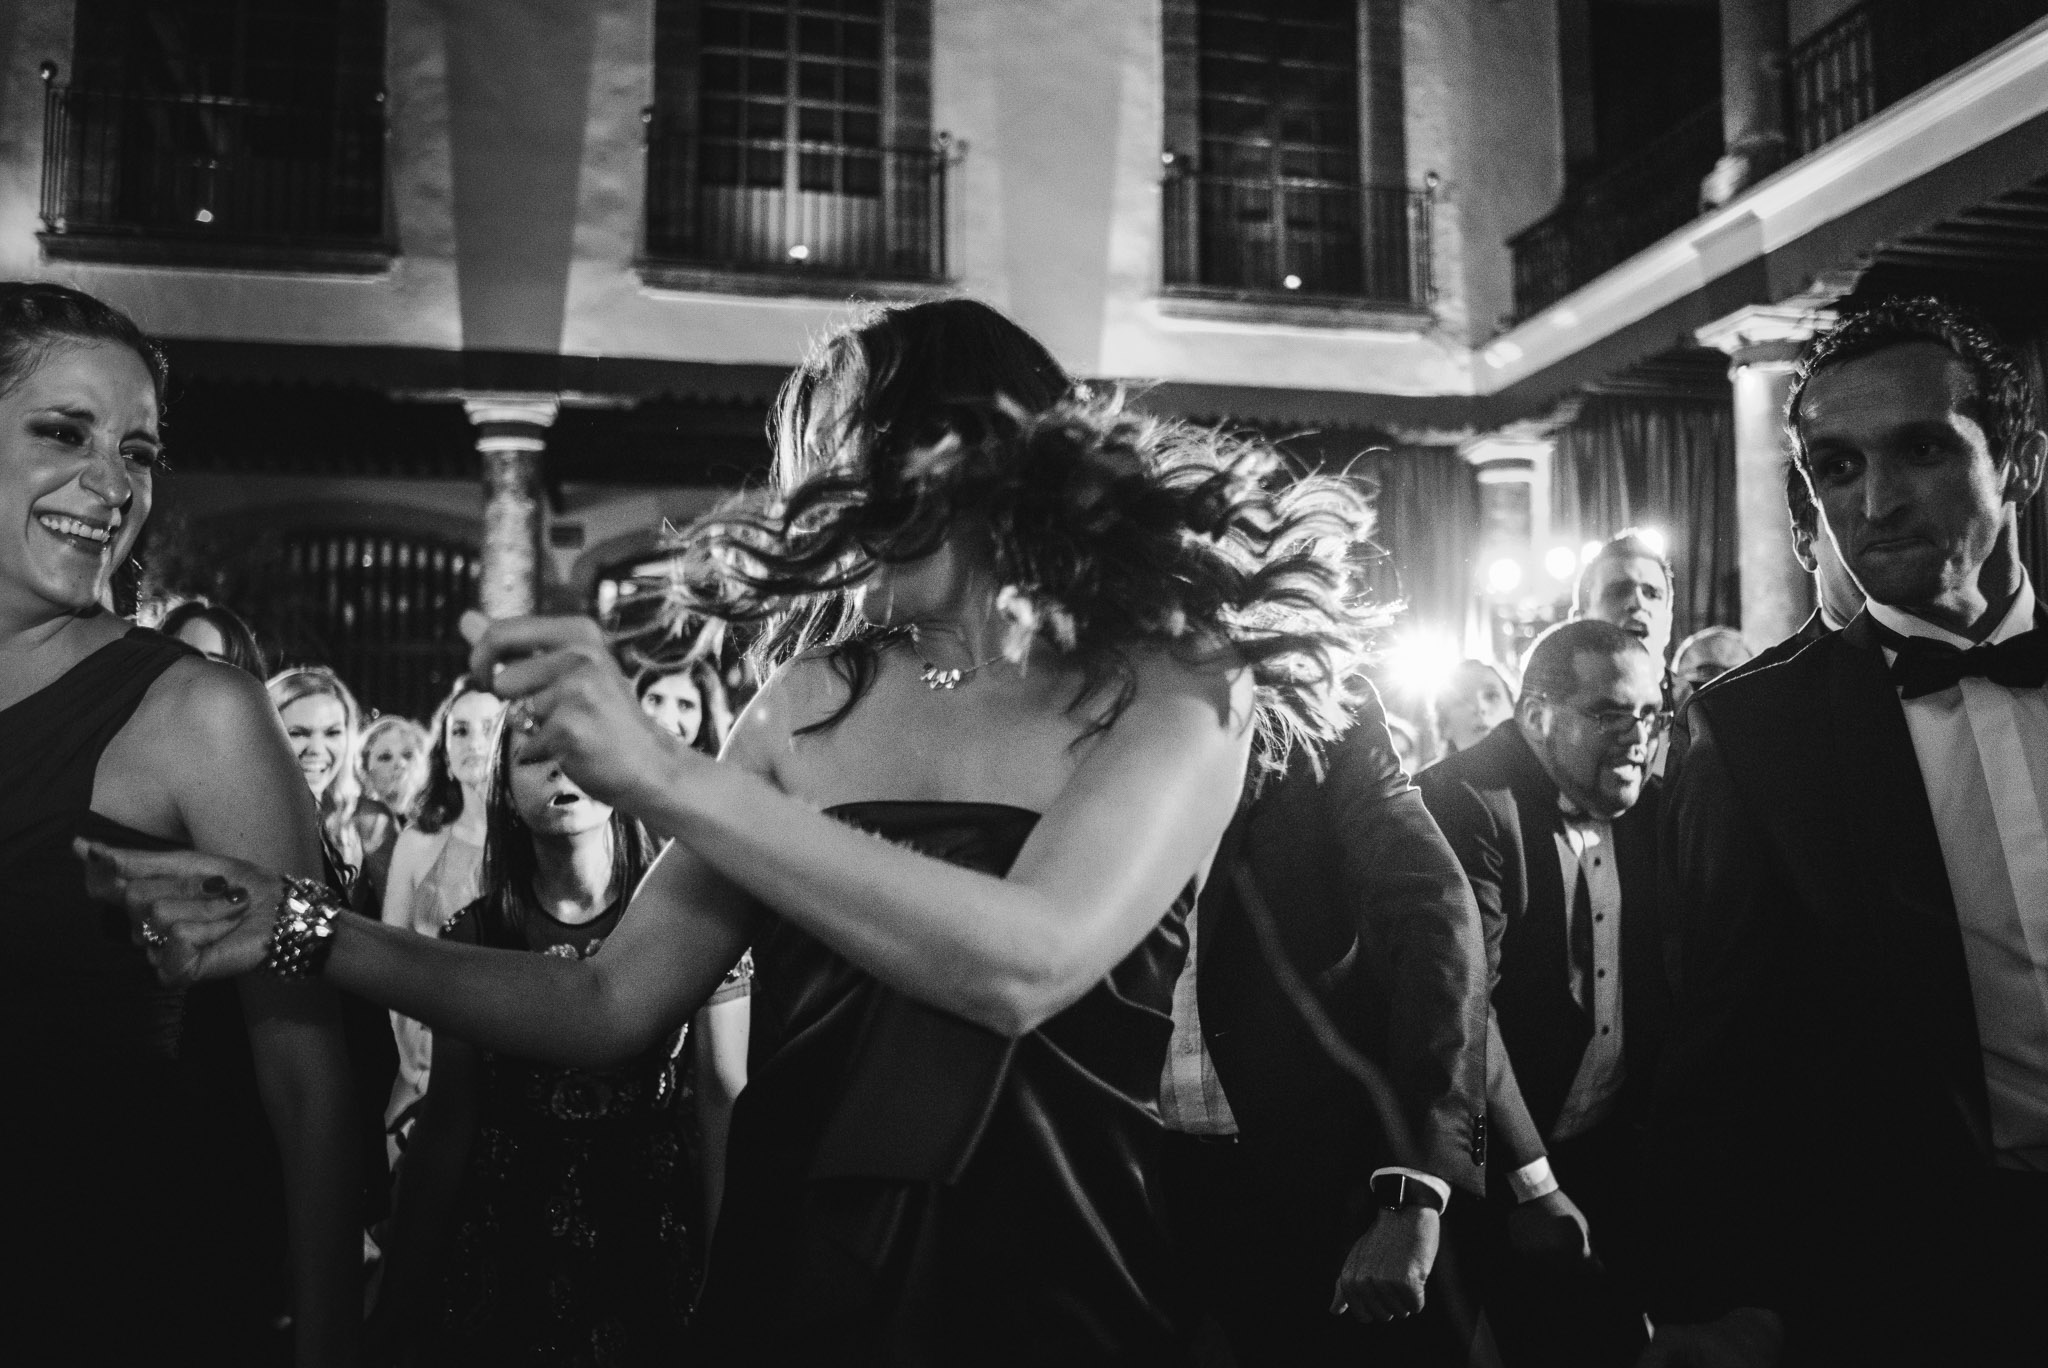 ©www.mauriziosolisbroca.com-20161002maurizio-solis-broca-mexico-canada-wedding-photographer20161002DSC05609-Edit.jpg